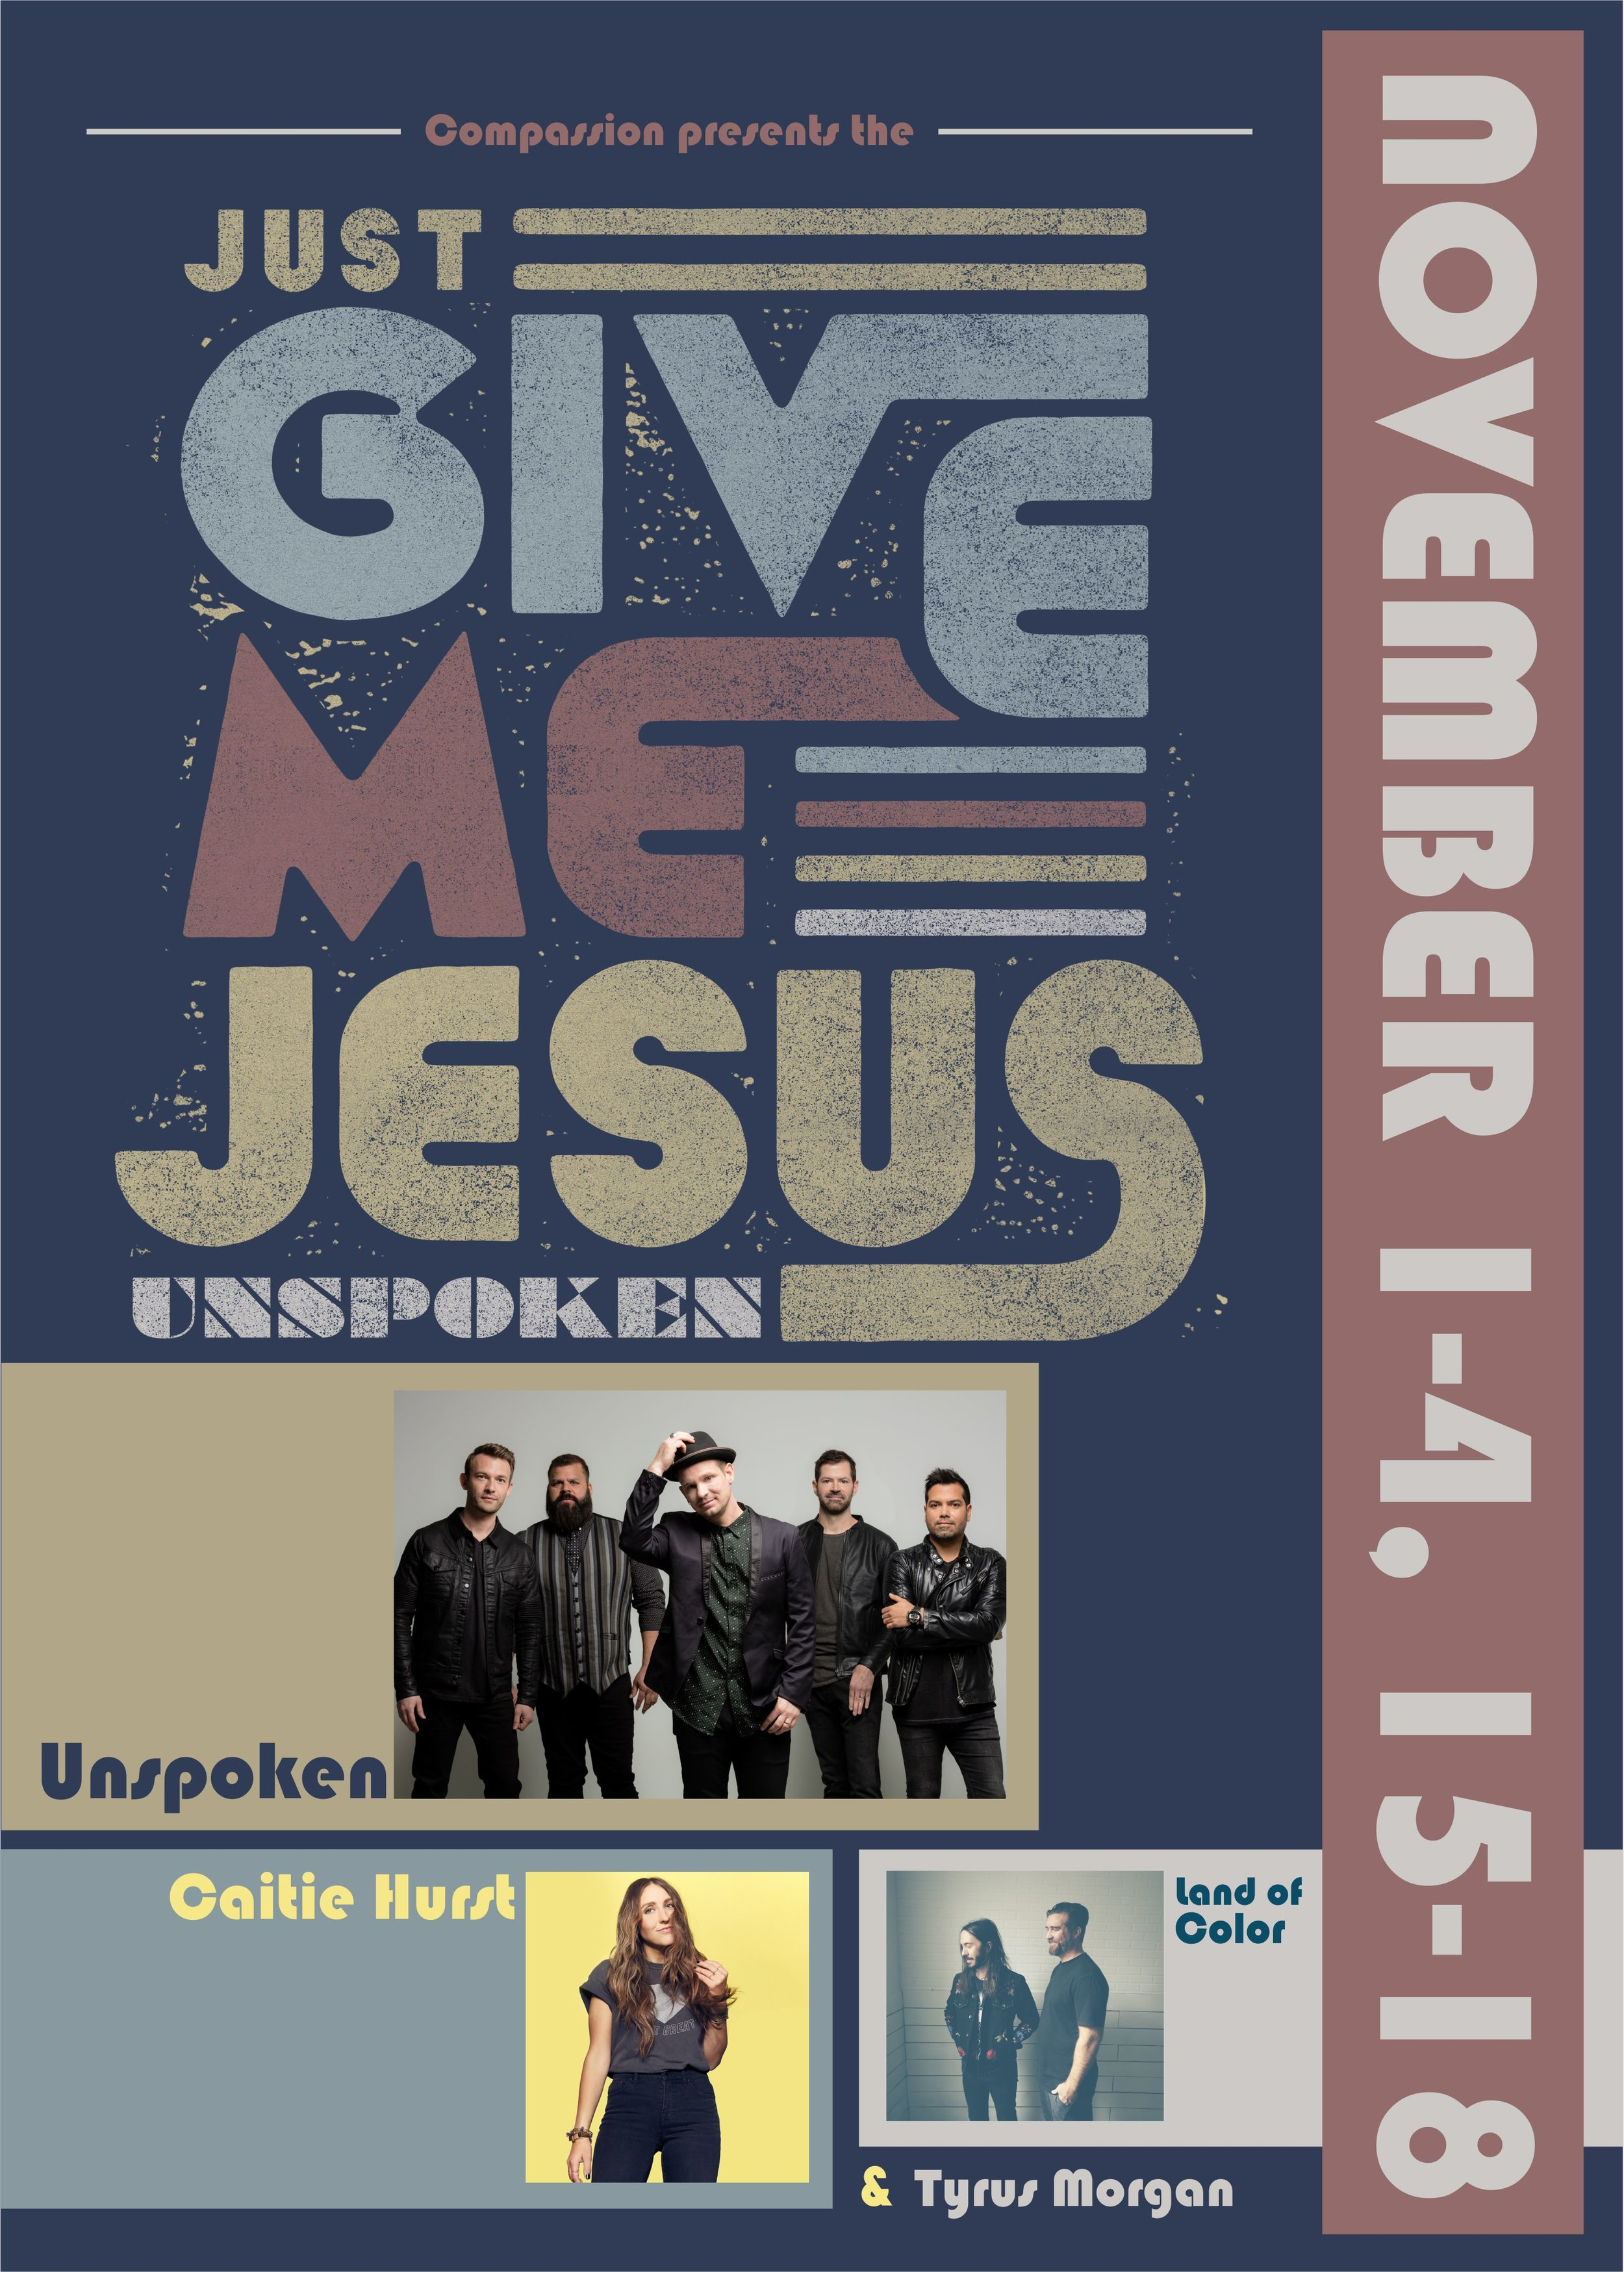 Just Give Me Jesus Tour jul 18.jpg